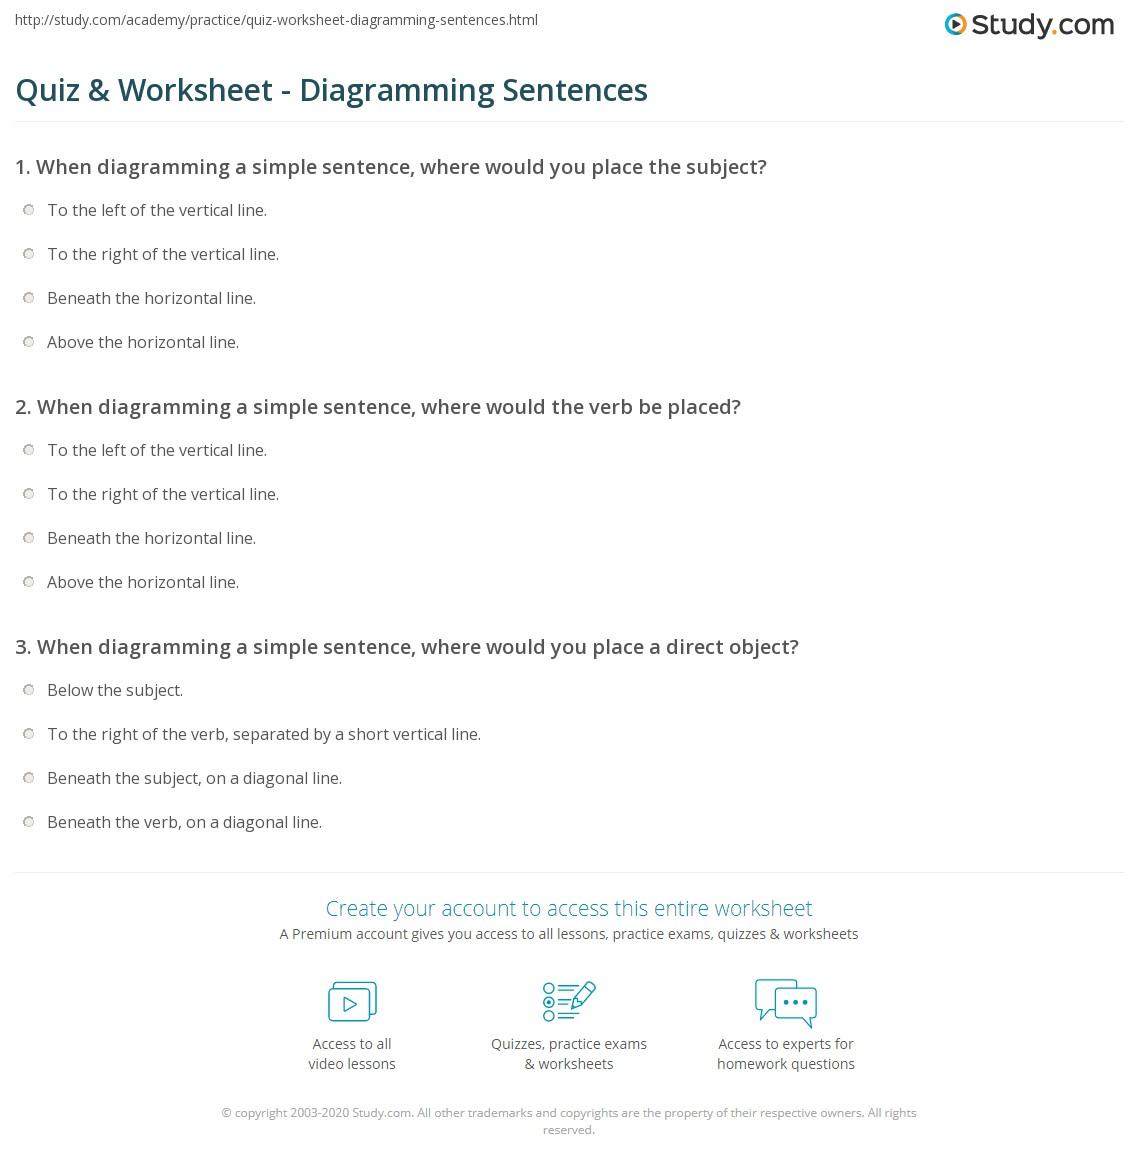 hight resolution of Quiz \u0026 Worksheet - Diagramming Sentences   Study.com